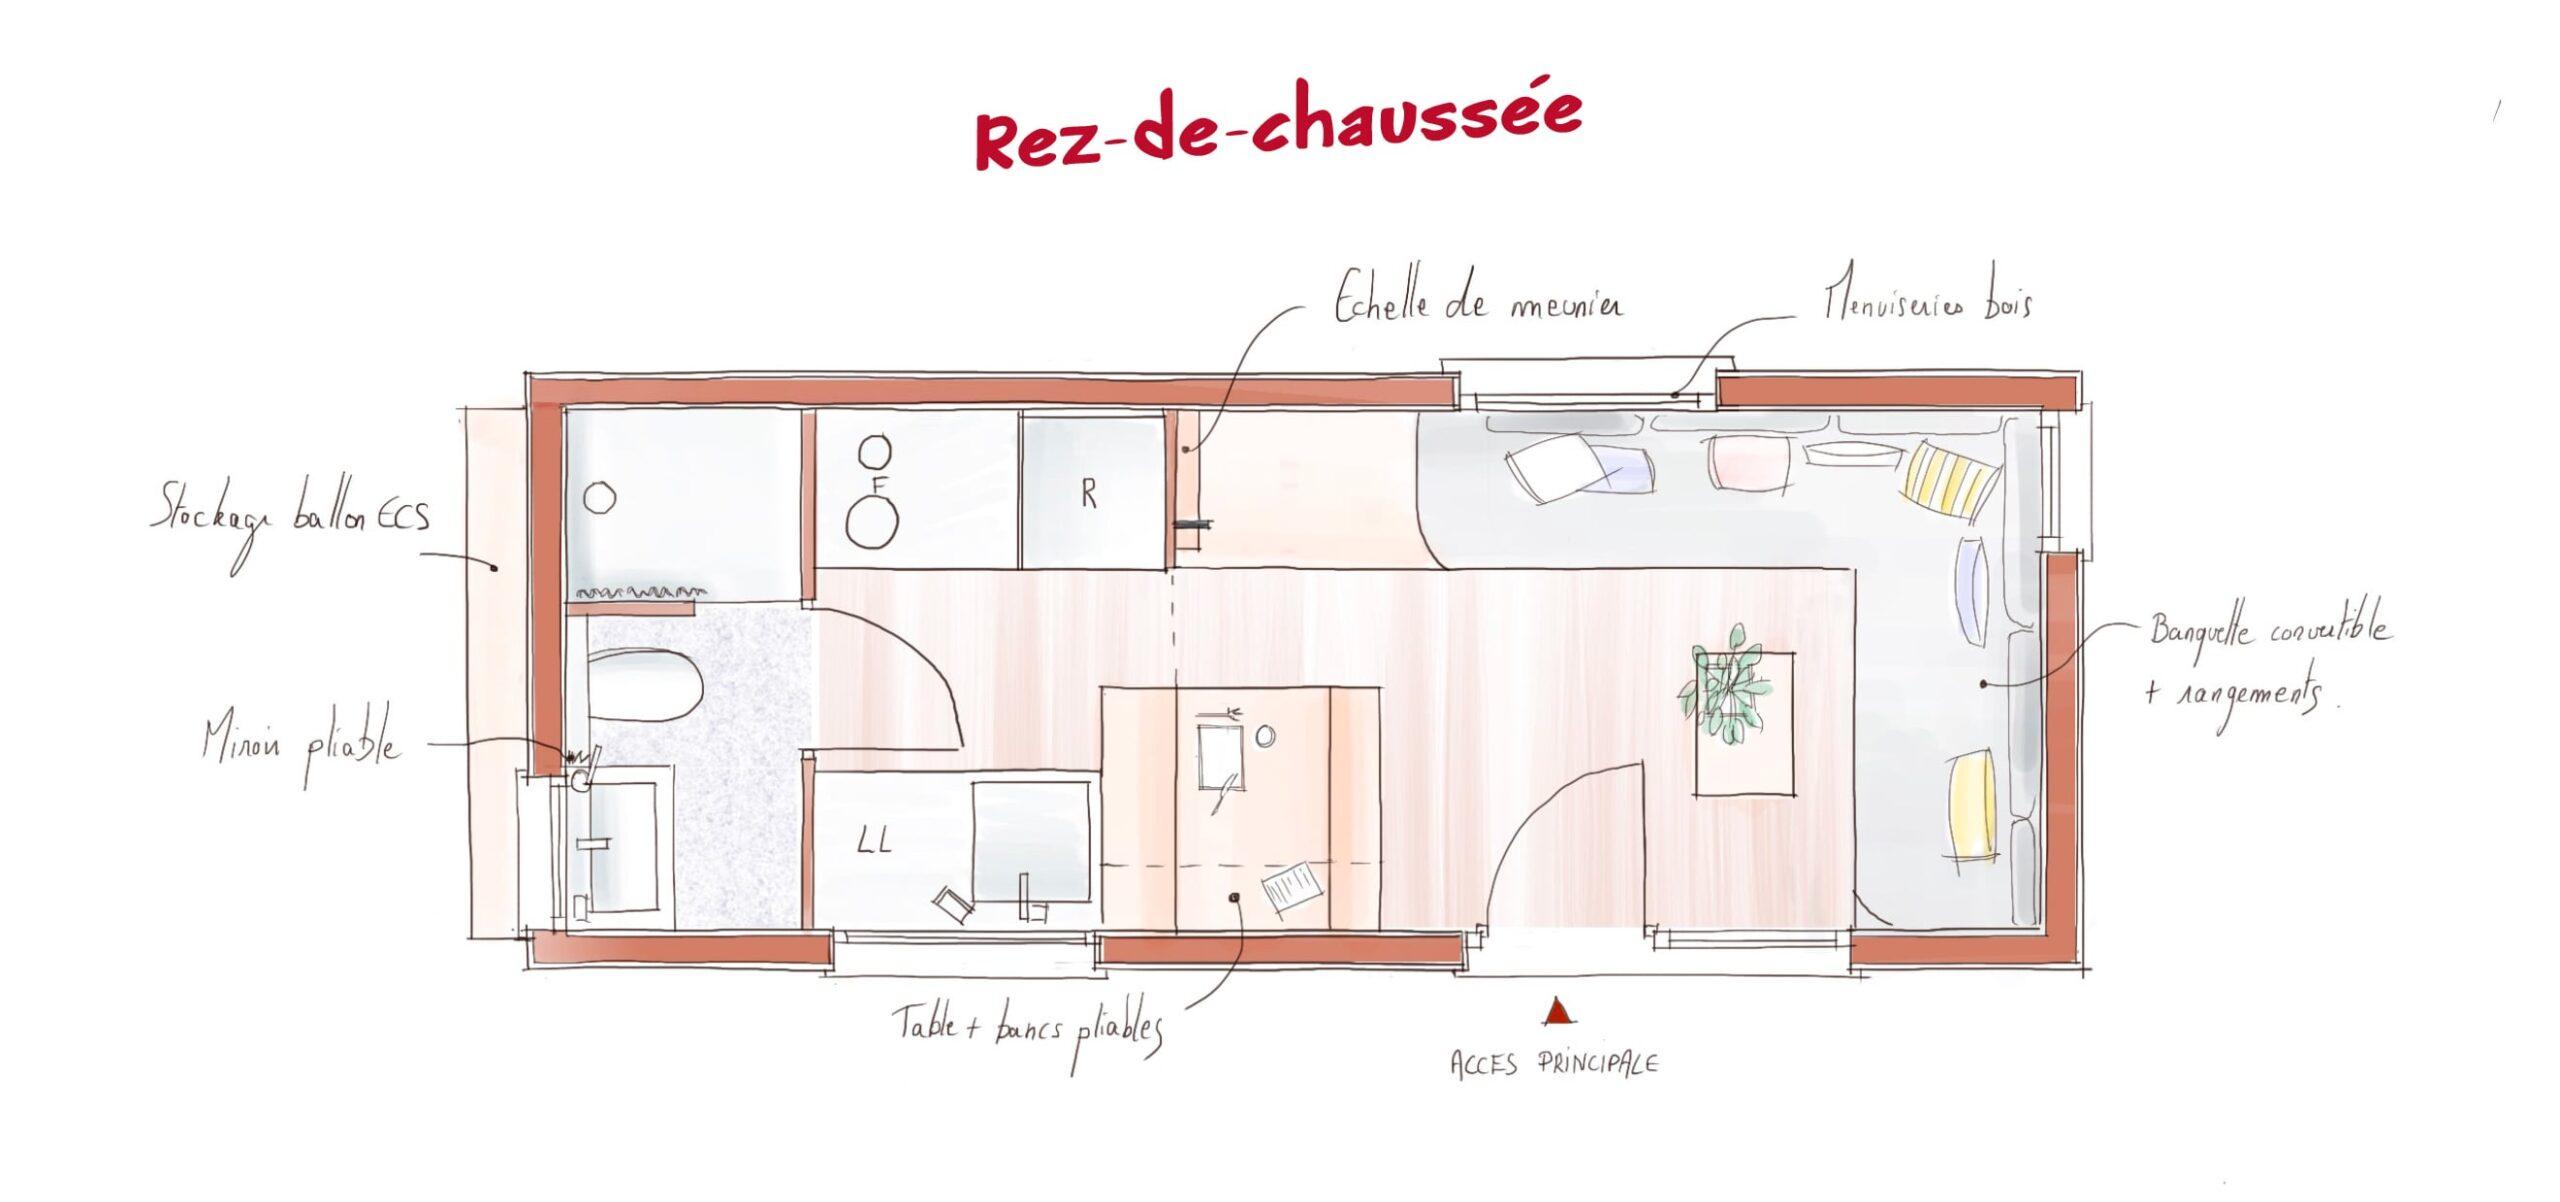 tiny-house-particulier-simply-rez-de-chaussee